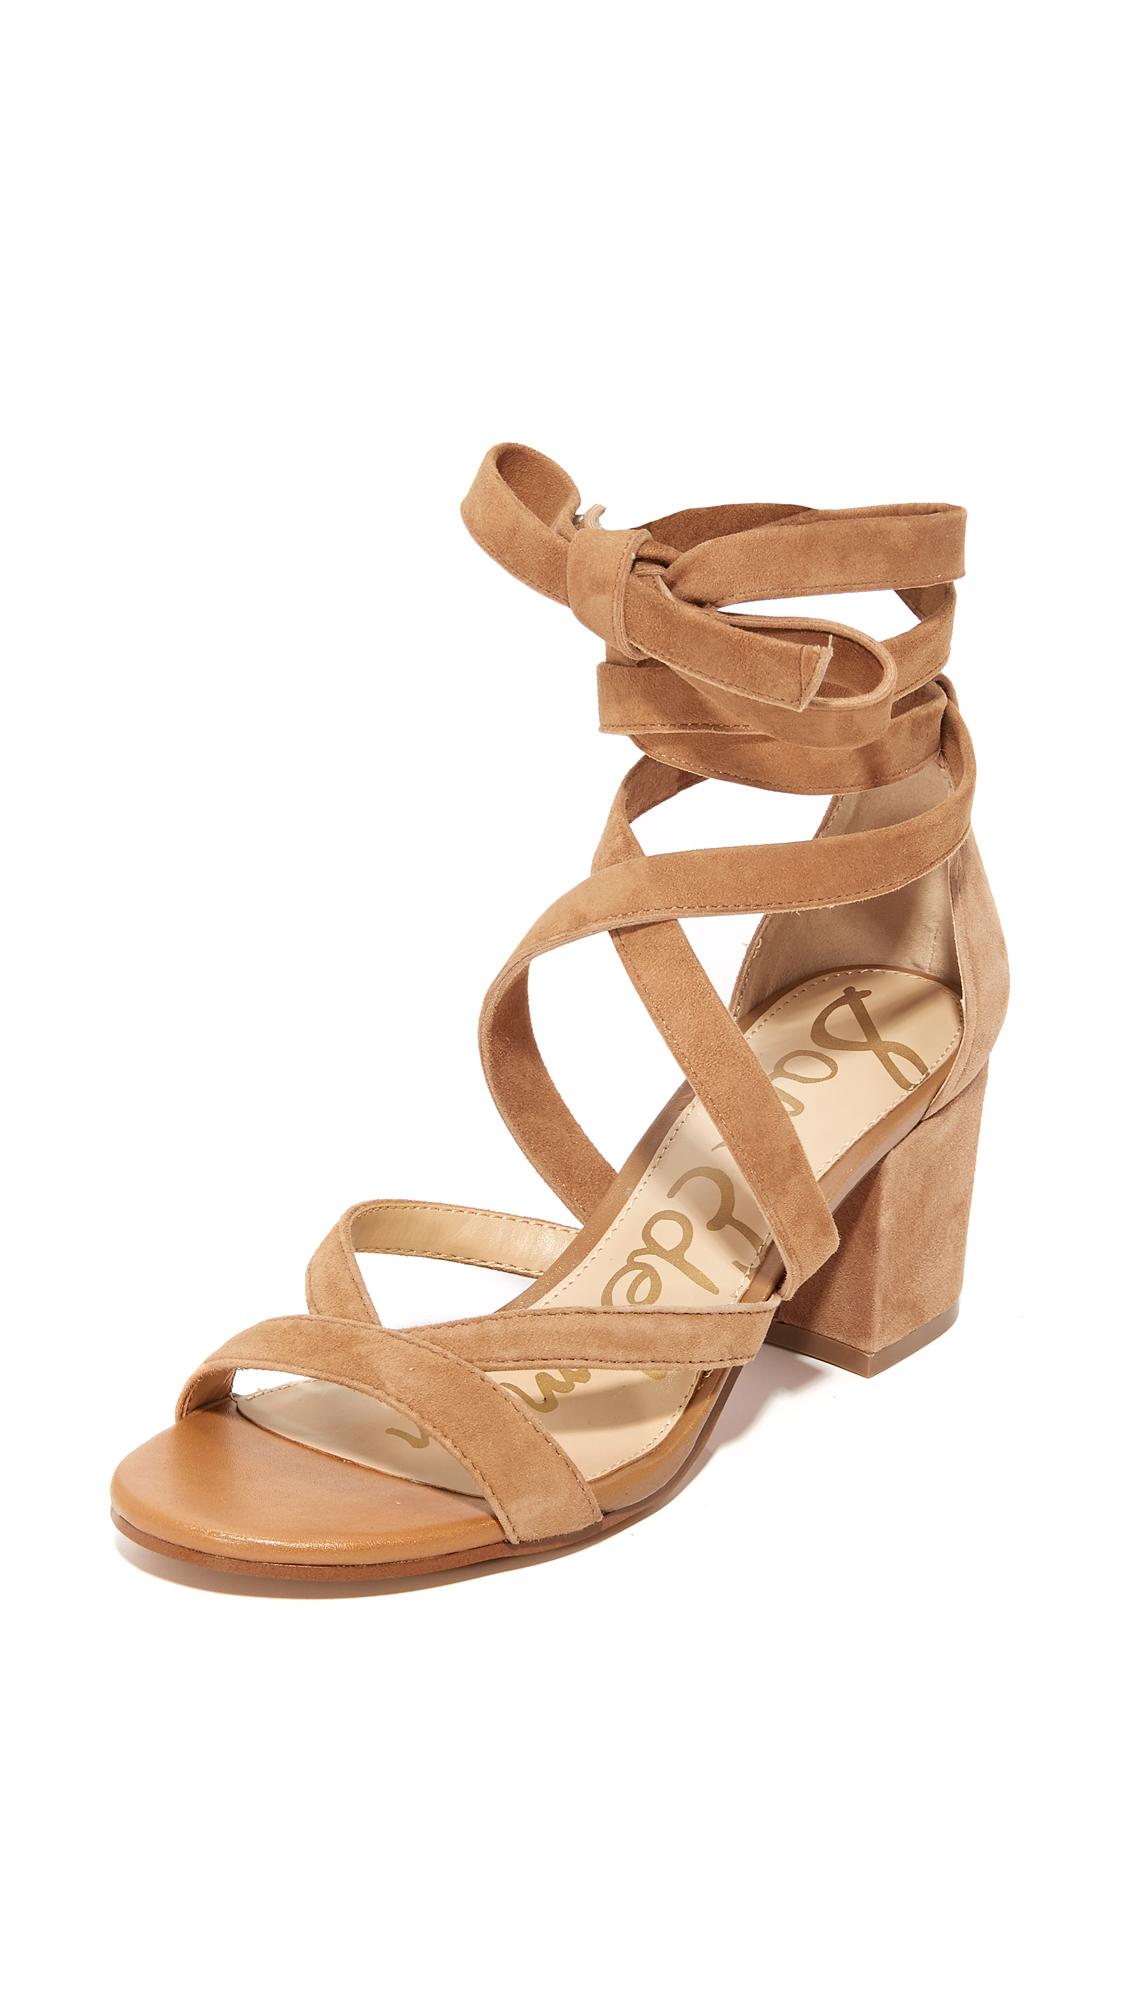 989a9361b2b Sam Edelman Sheri Suede City Sandals